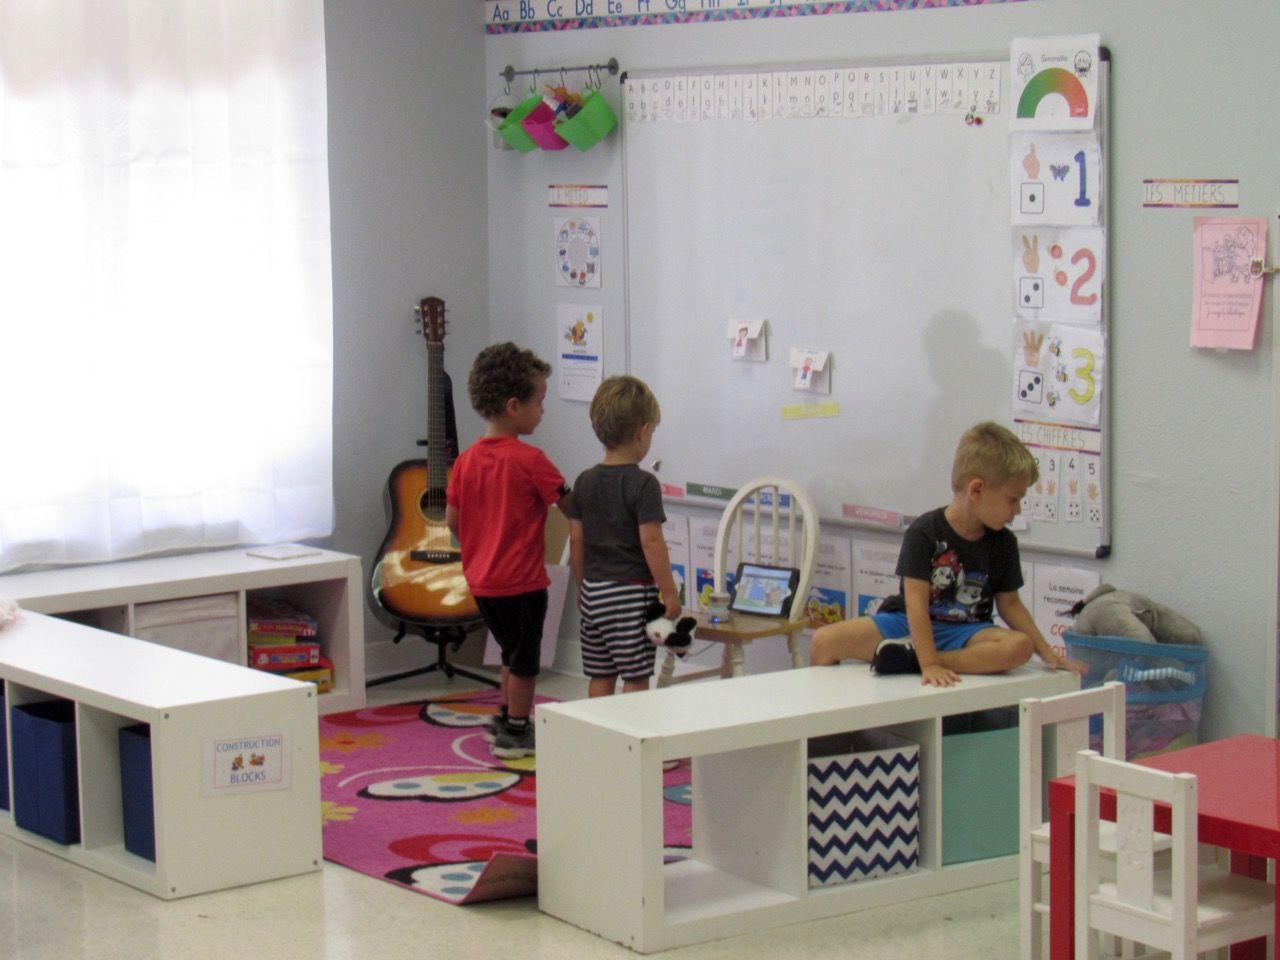 Ecole Le Petit Prince French International School de Boca Raton